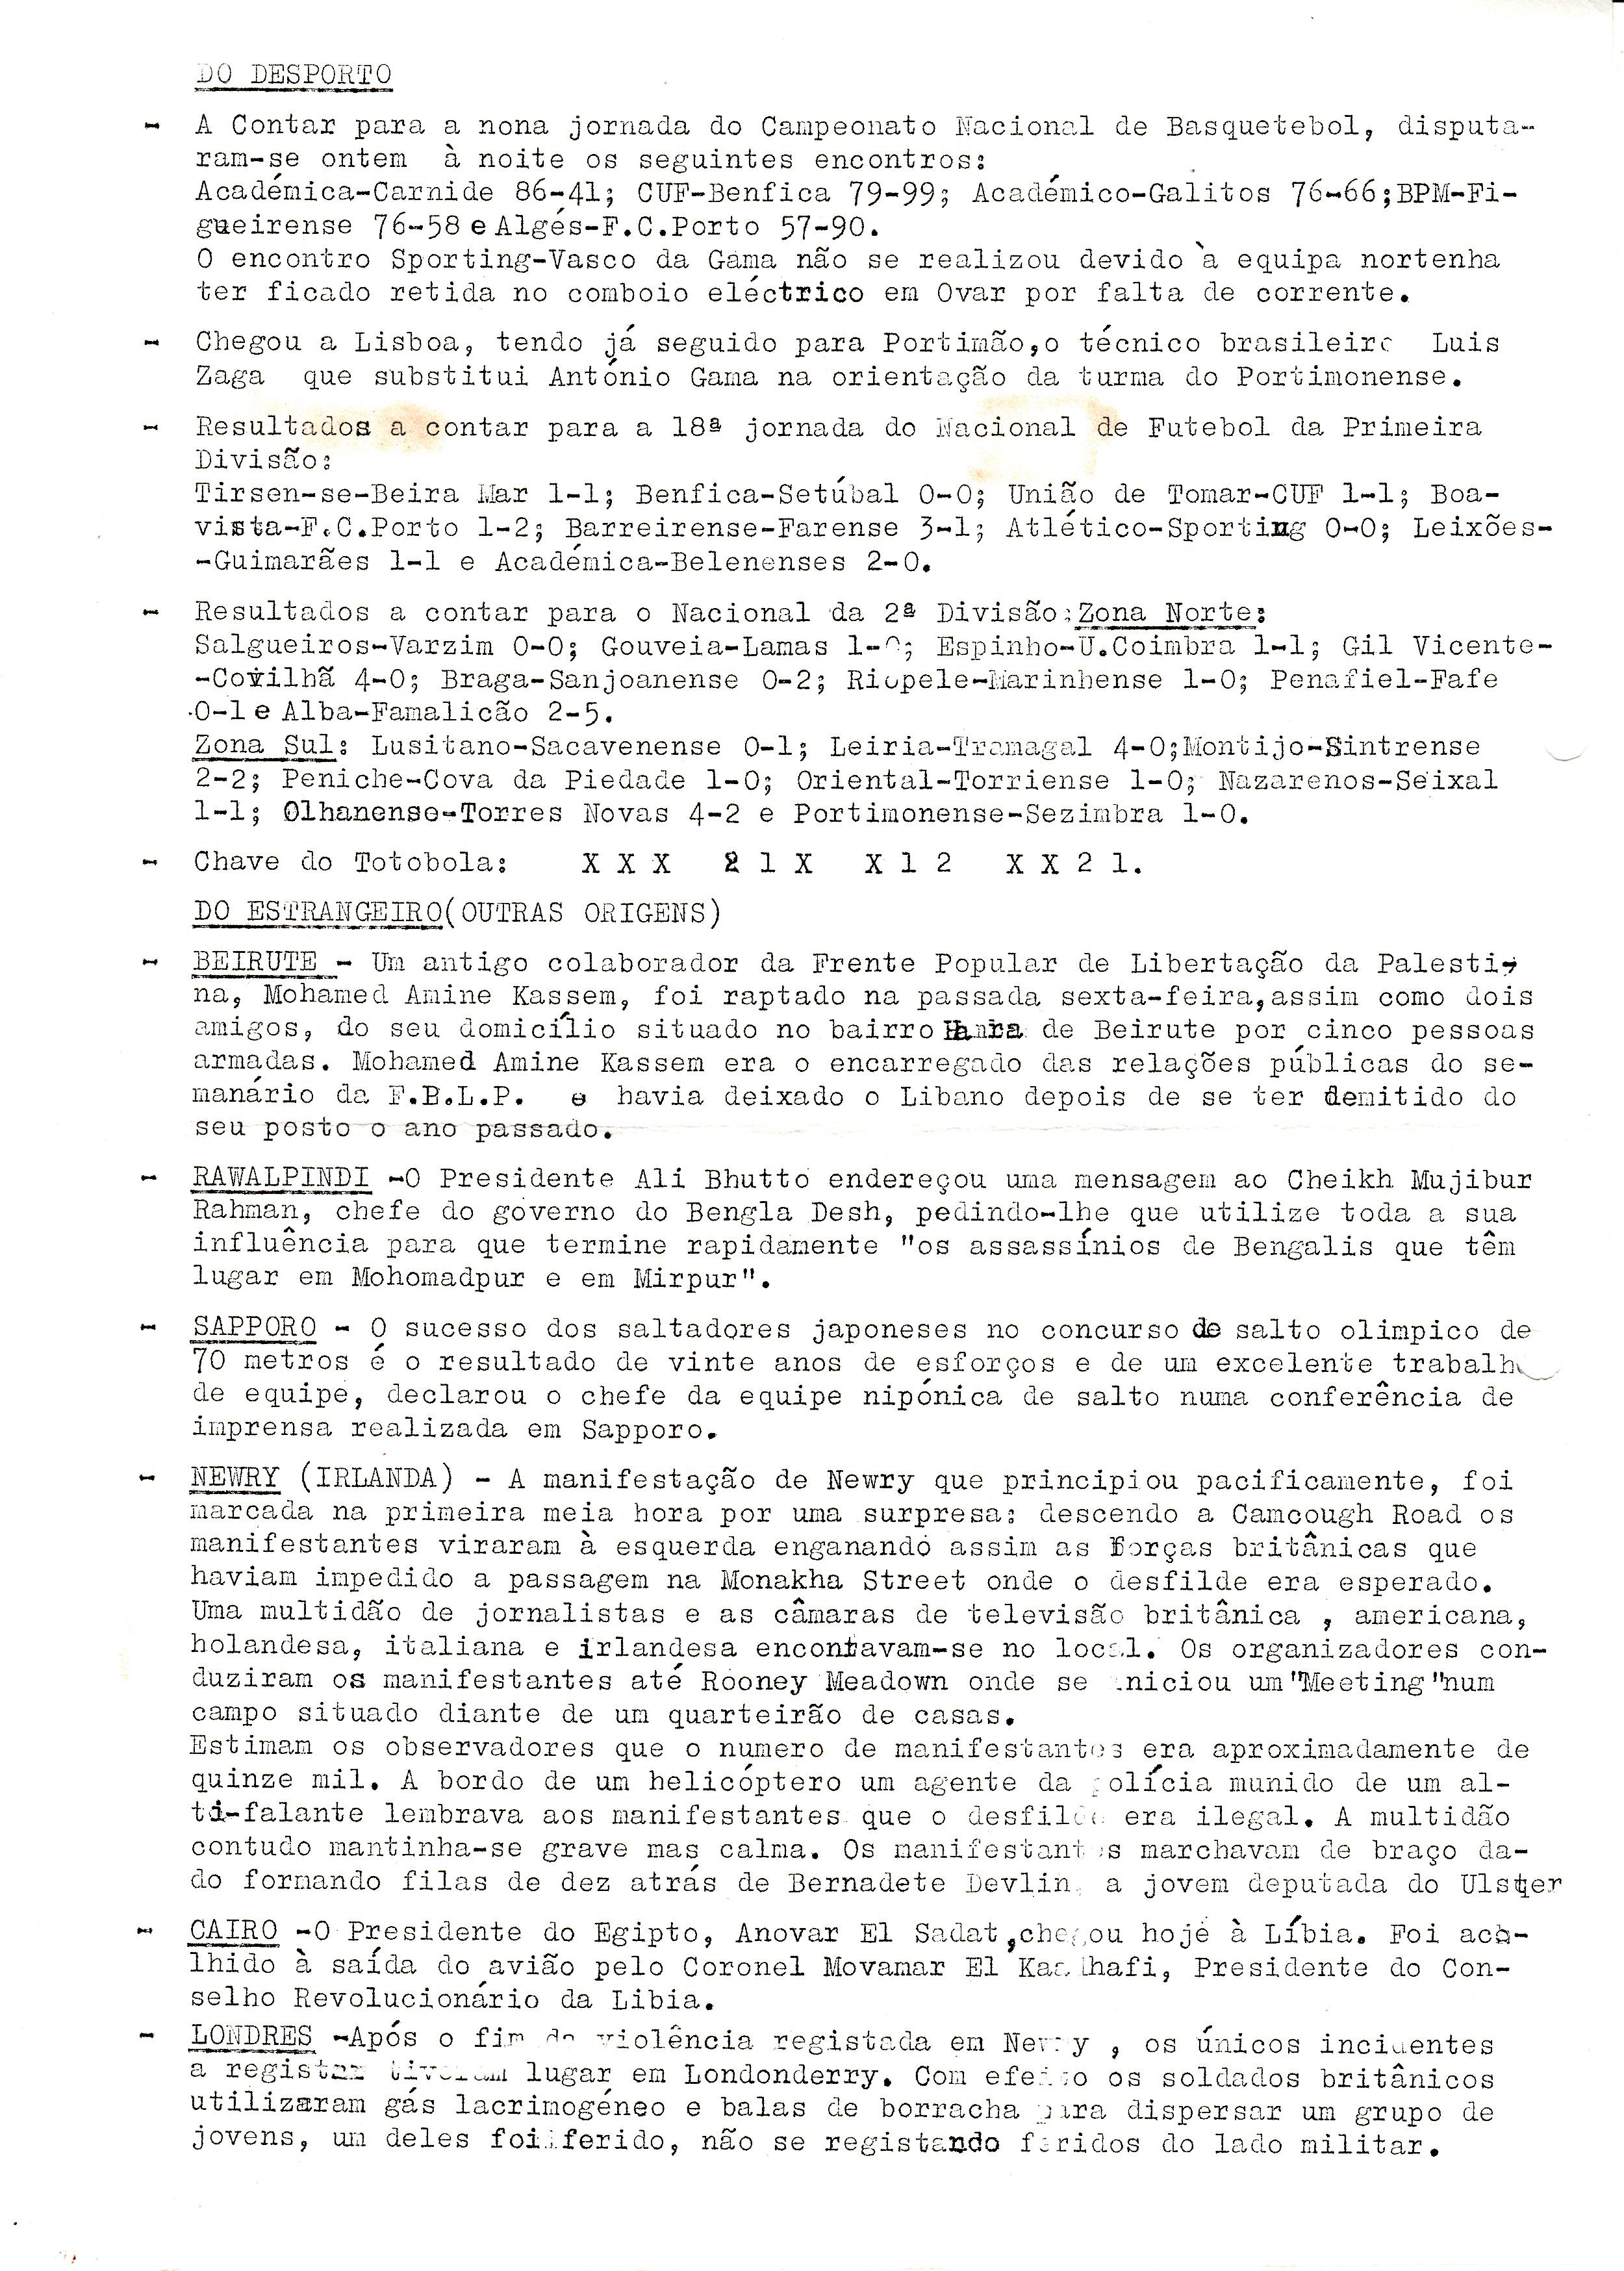 Presse_1972_02_06_0002